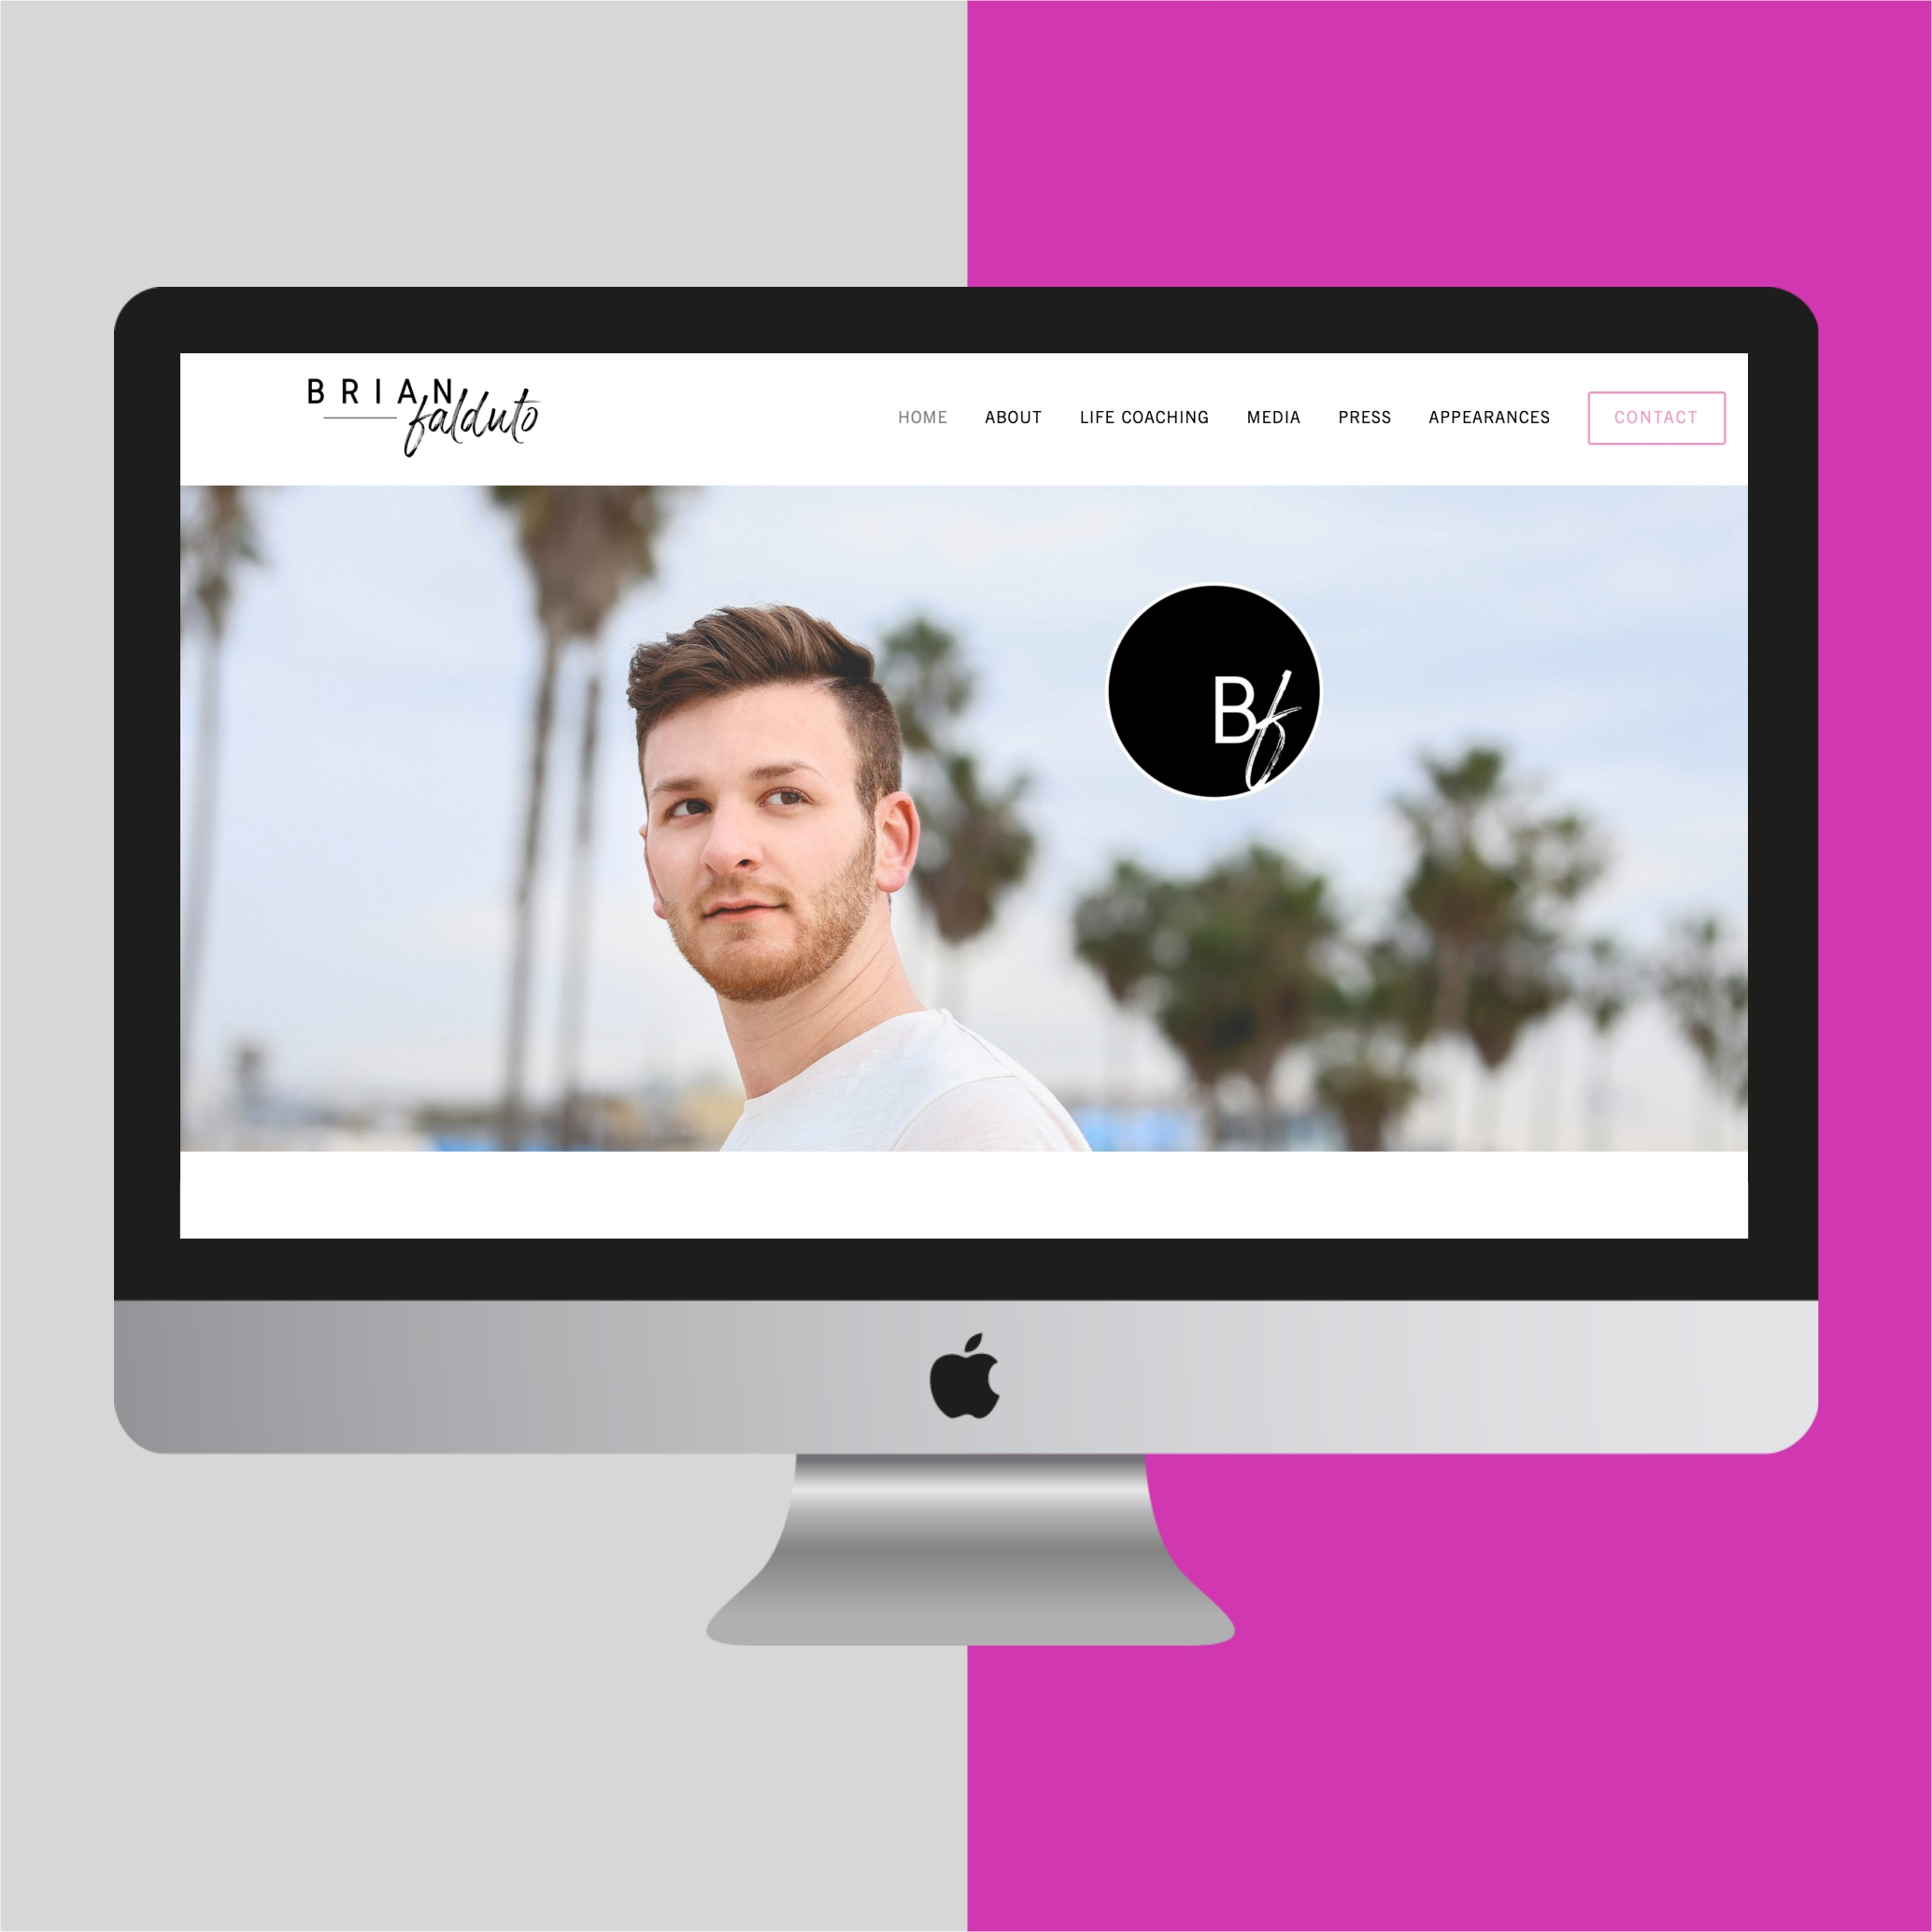 Brian Falduto Website